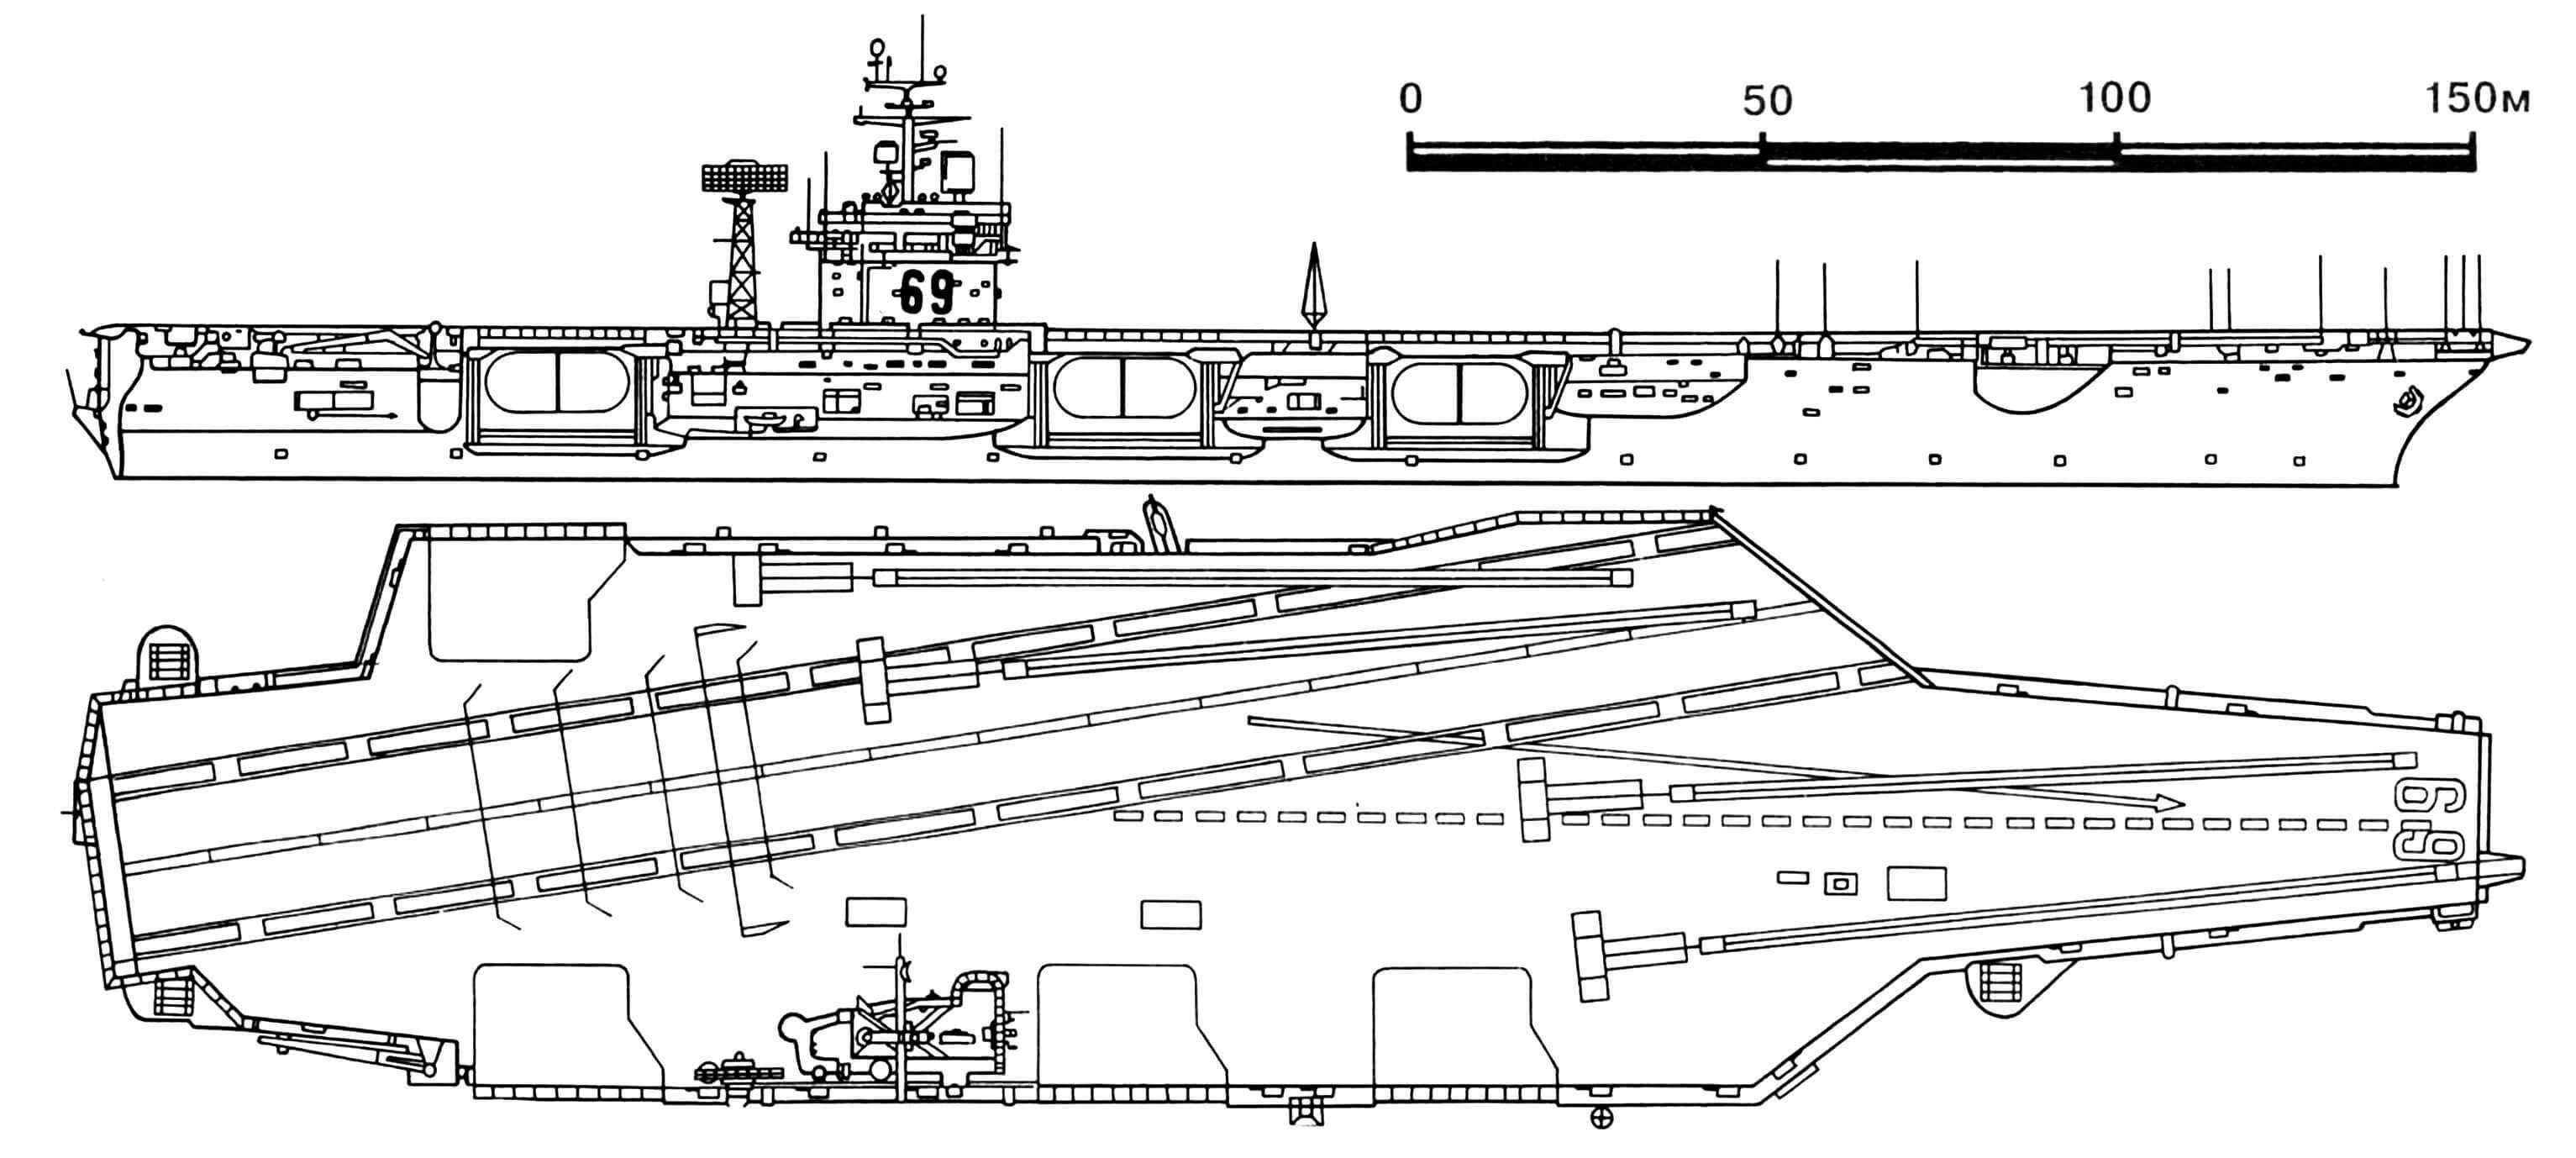 Атомный ударный авианосец «Дуайт Эйзенхауэр» типа «Честер У. Нимиц».